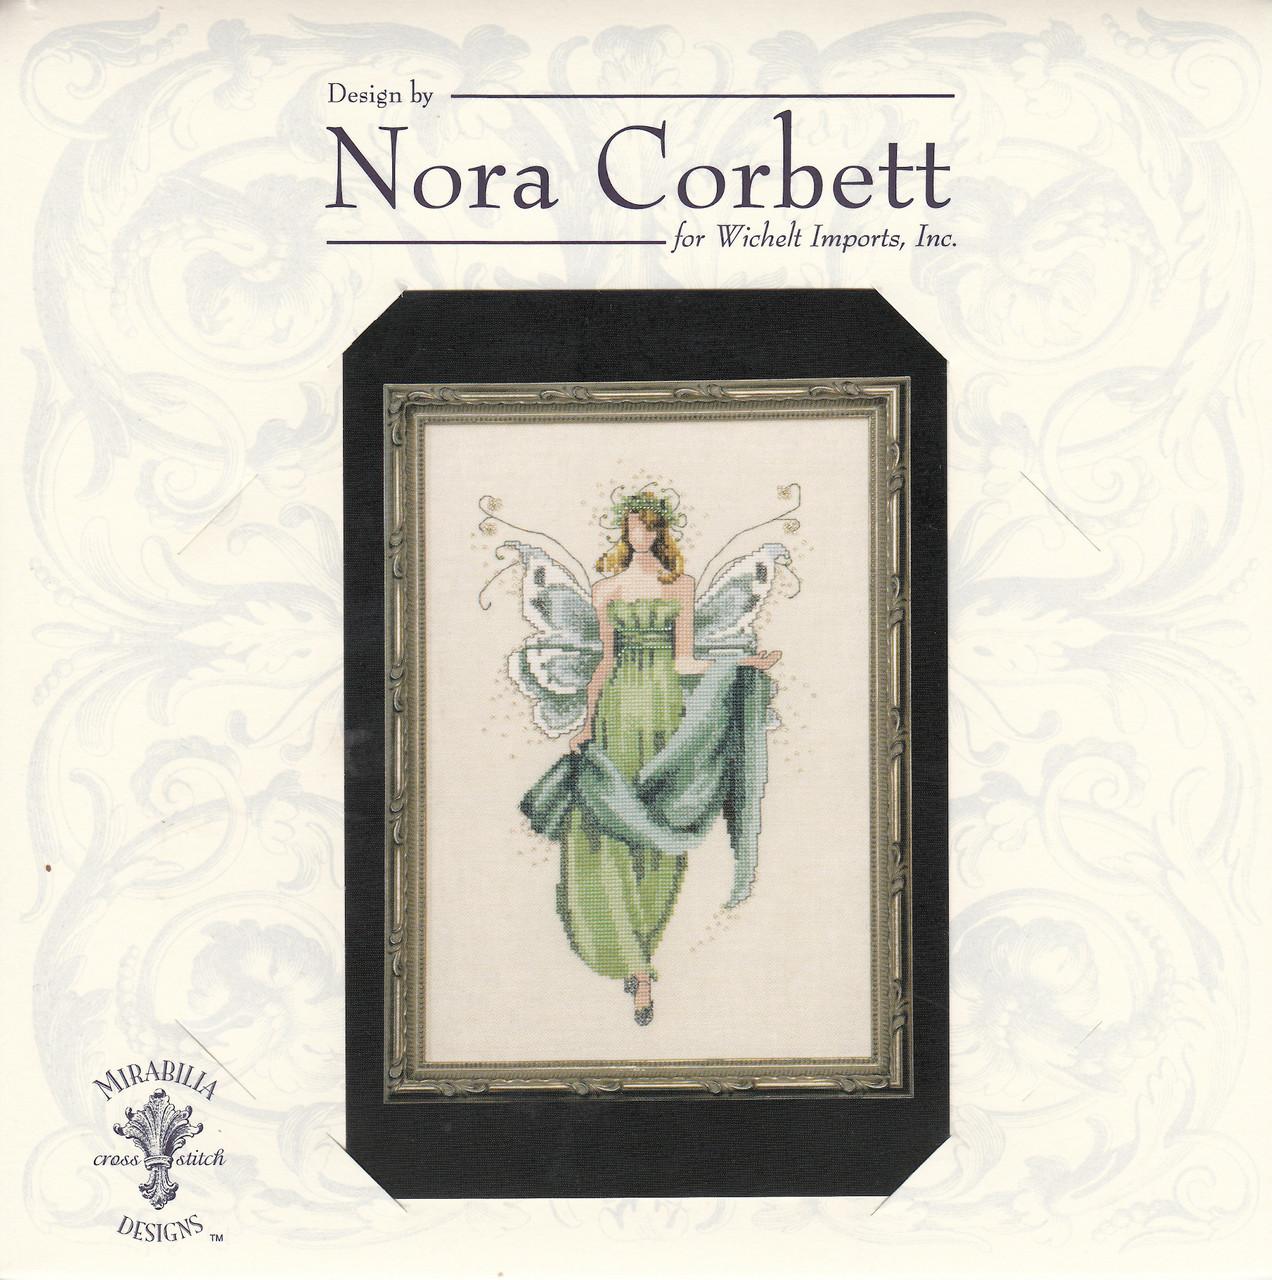 Nora Corbett - Fern